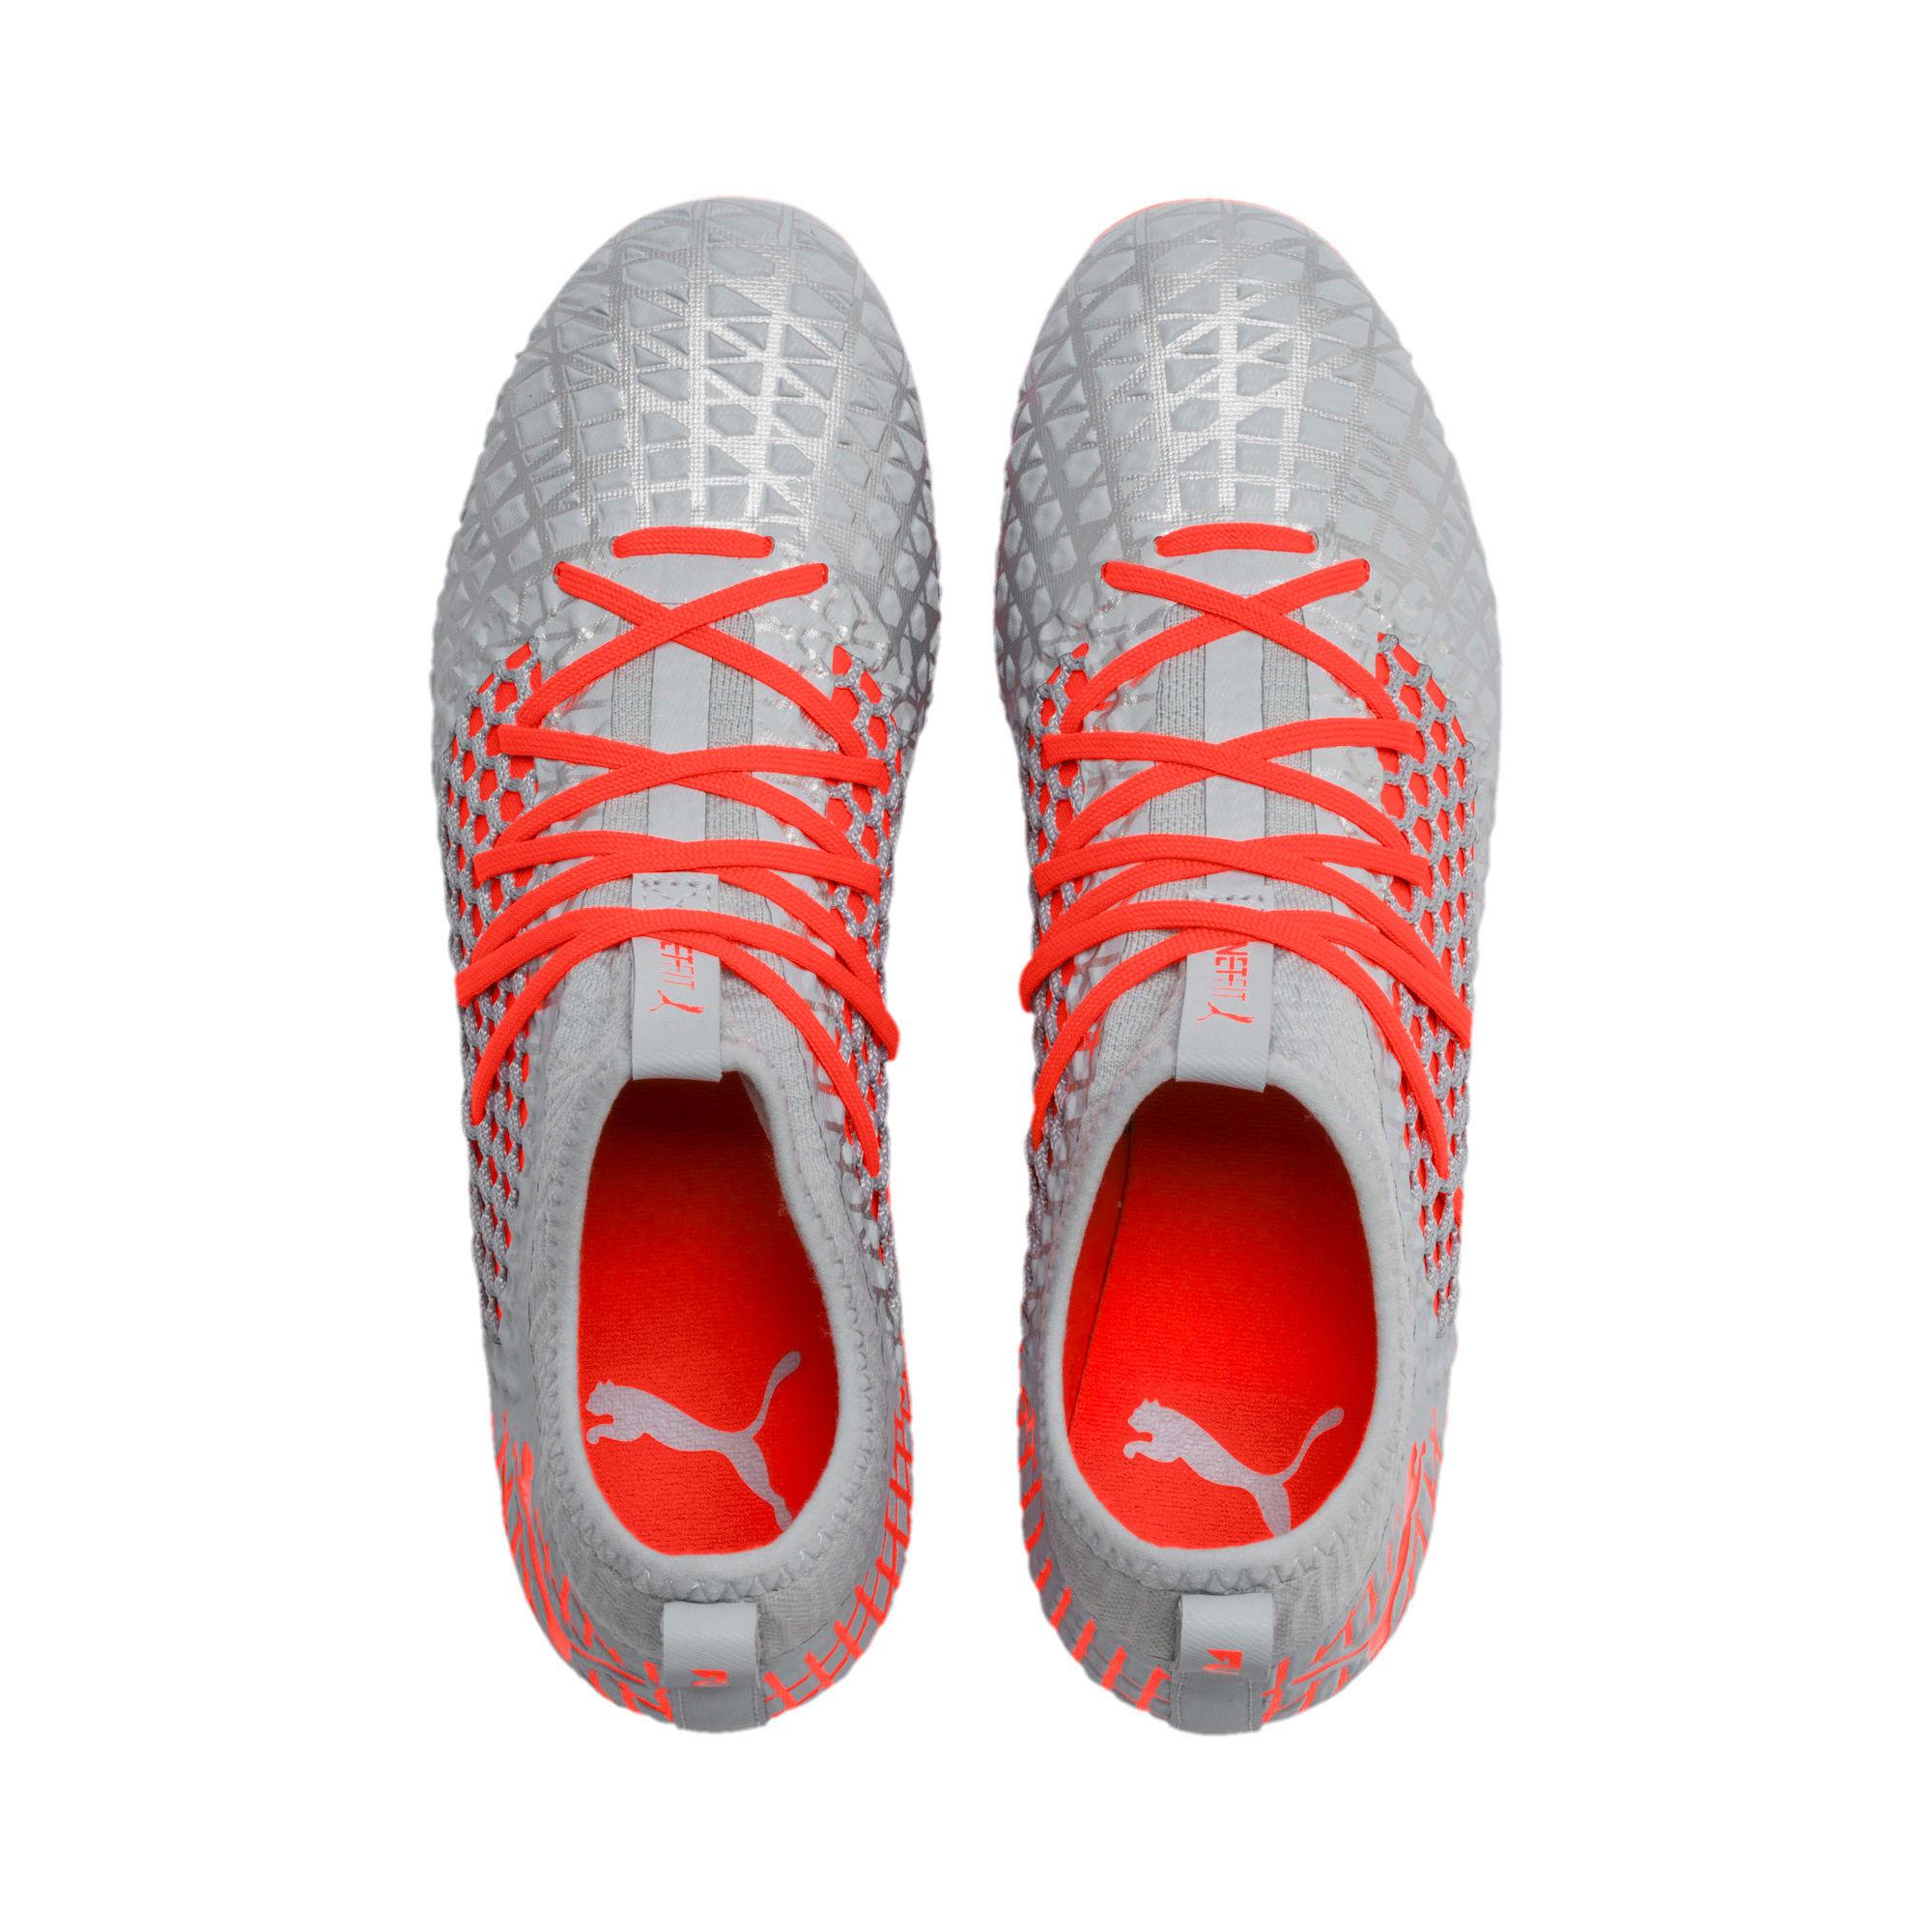 Thumbnail 7 of Chaussure de foot FUTURE 4.3 NETFIT FG/AG pour homme, Glacial Blue-Nrgy Red, medium